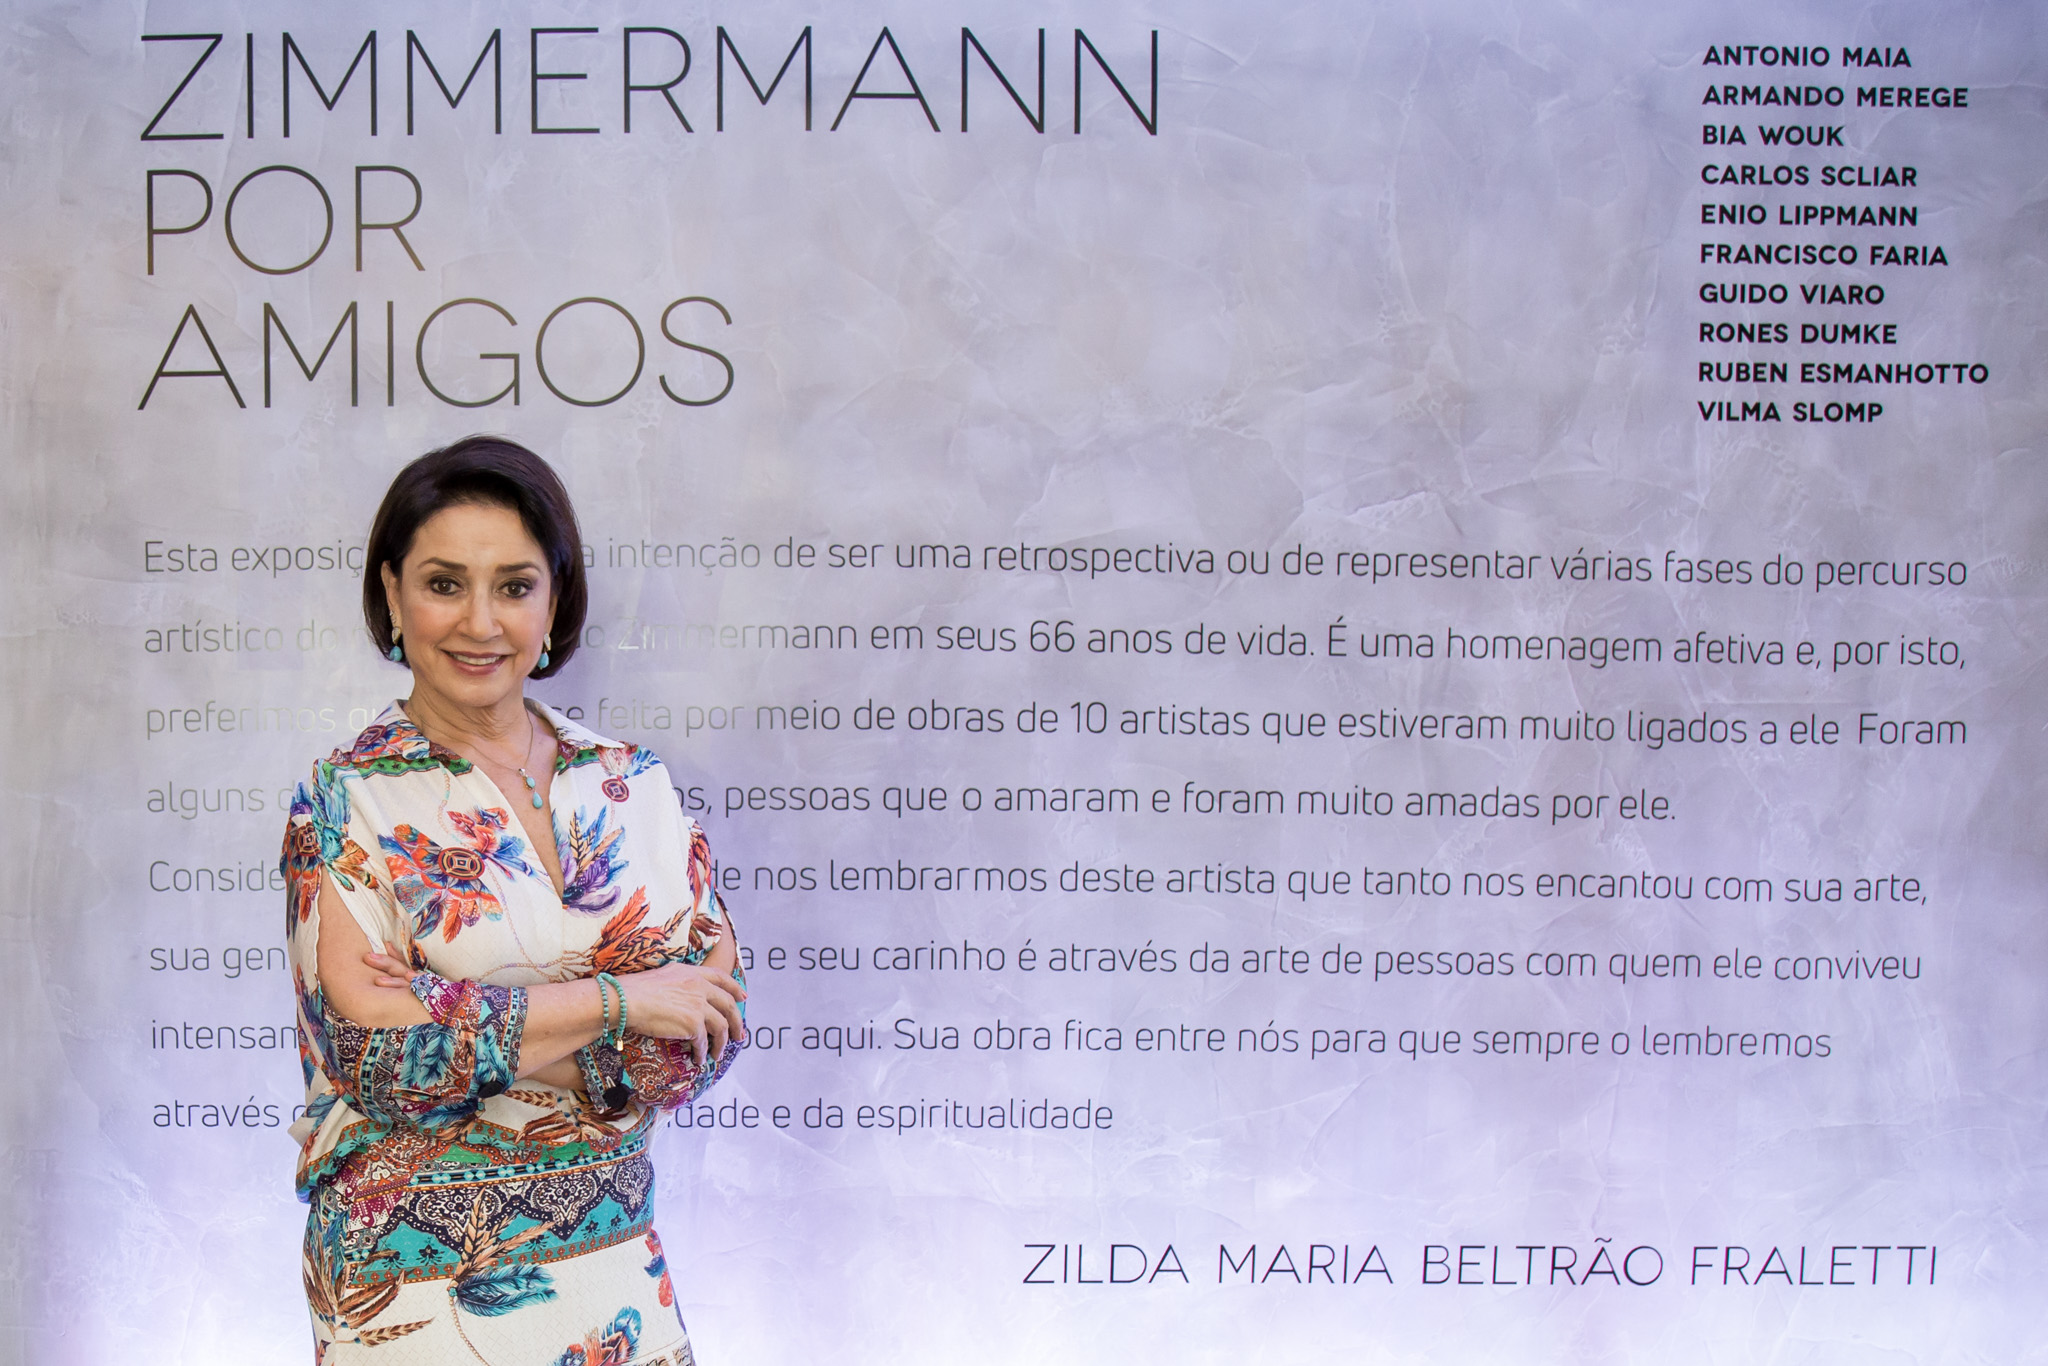 A galerista Zilda Fraletti, curadora da exposição Zimmermann por Amigos. Fotos: Cintya Hein